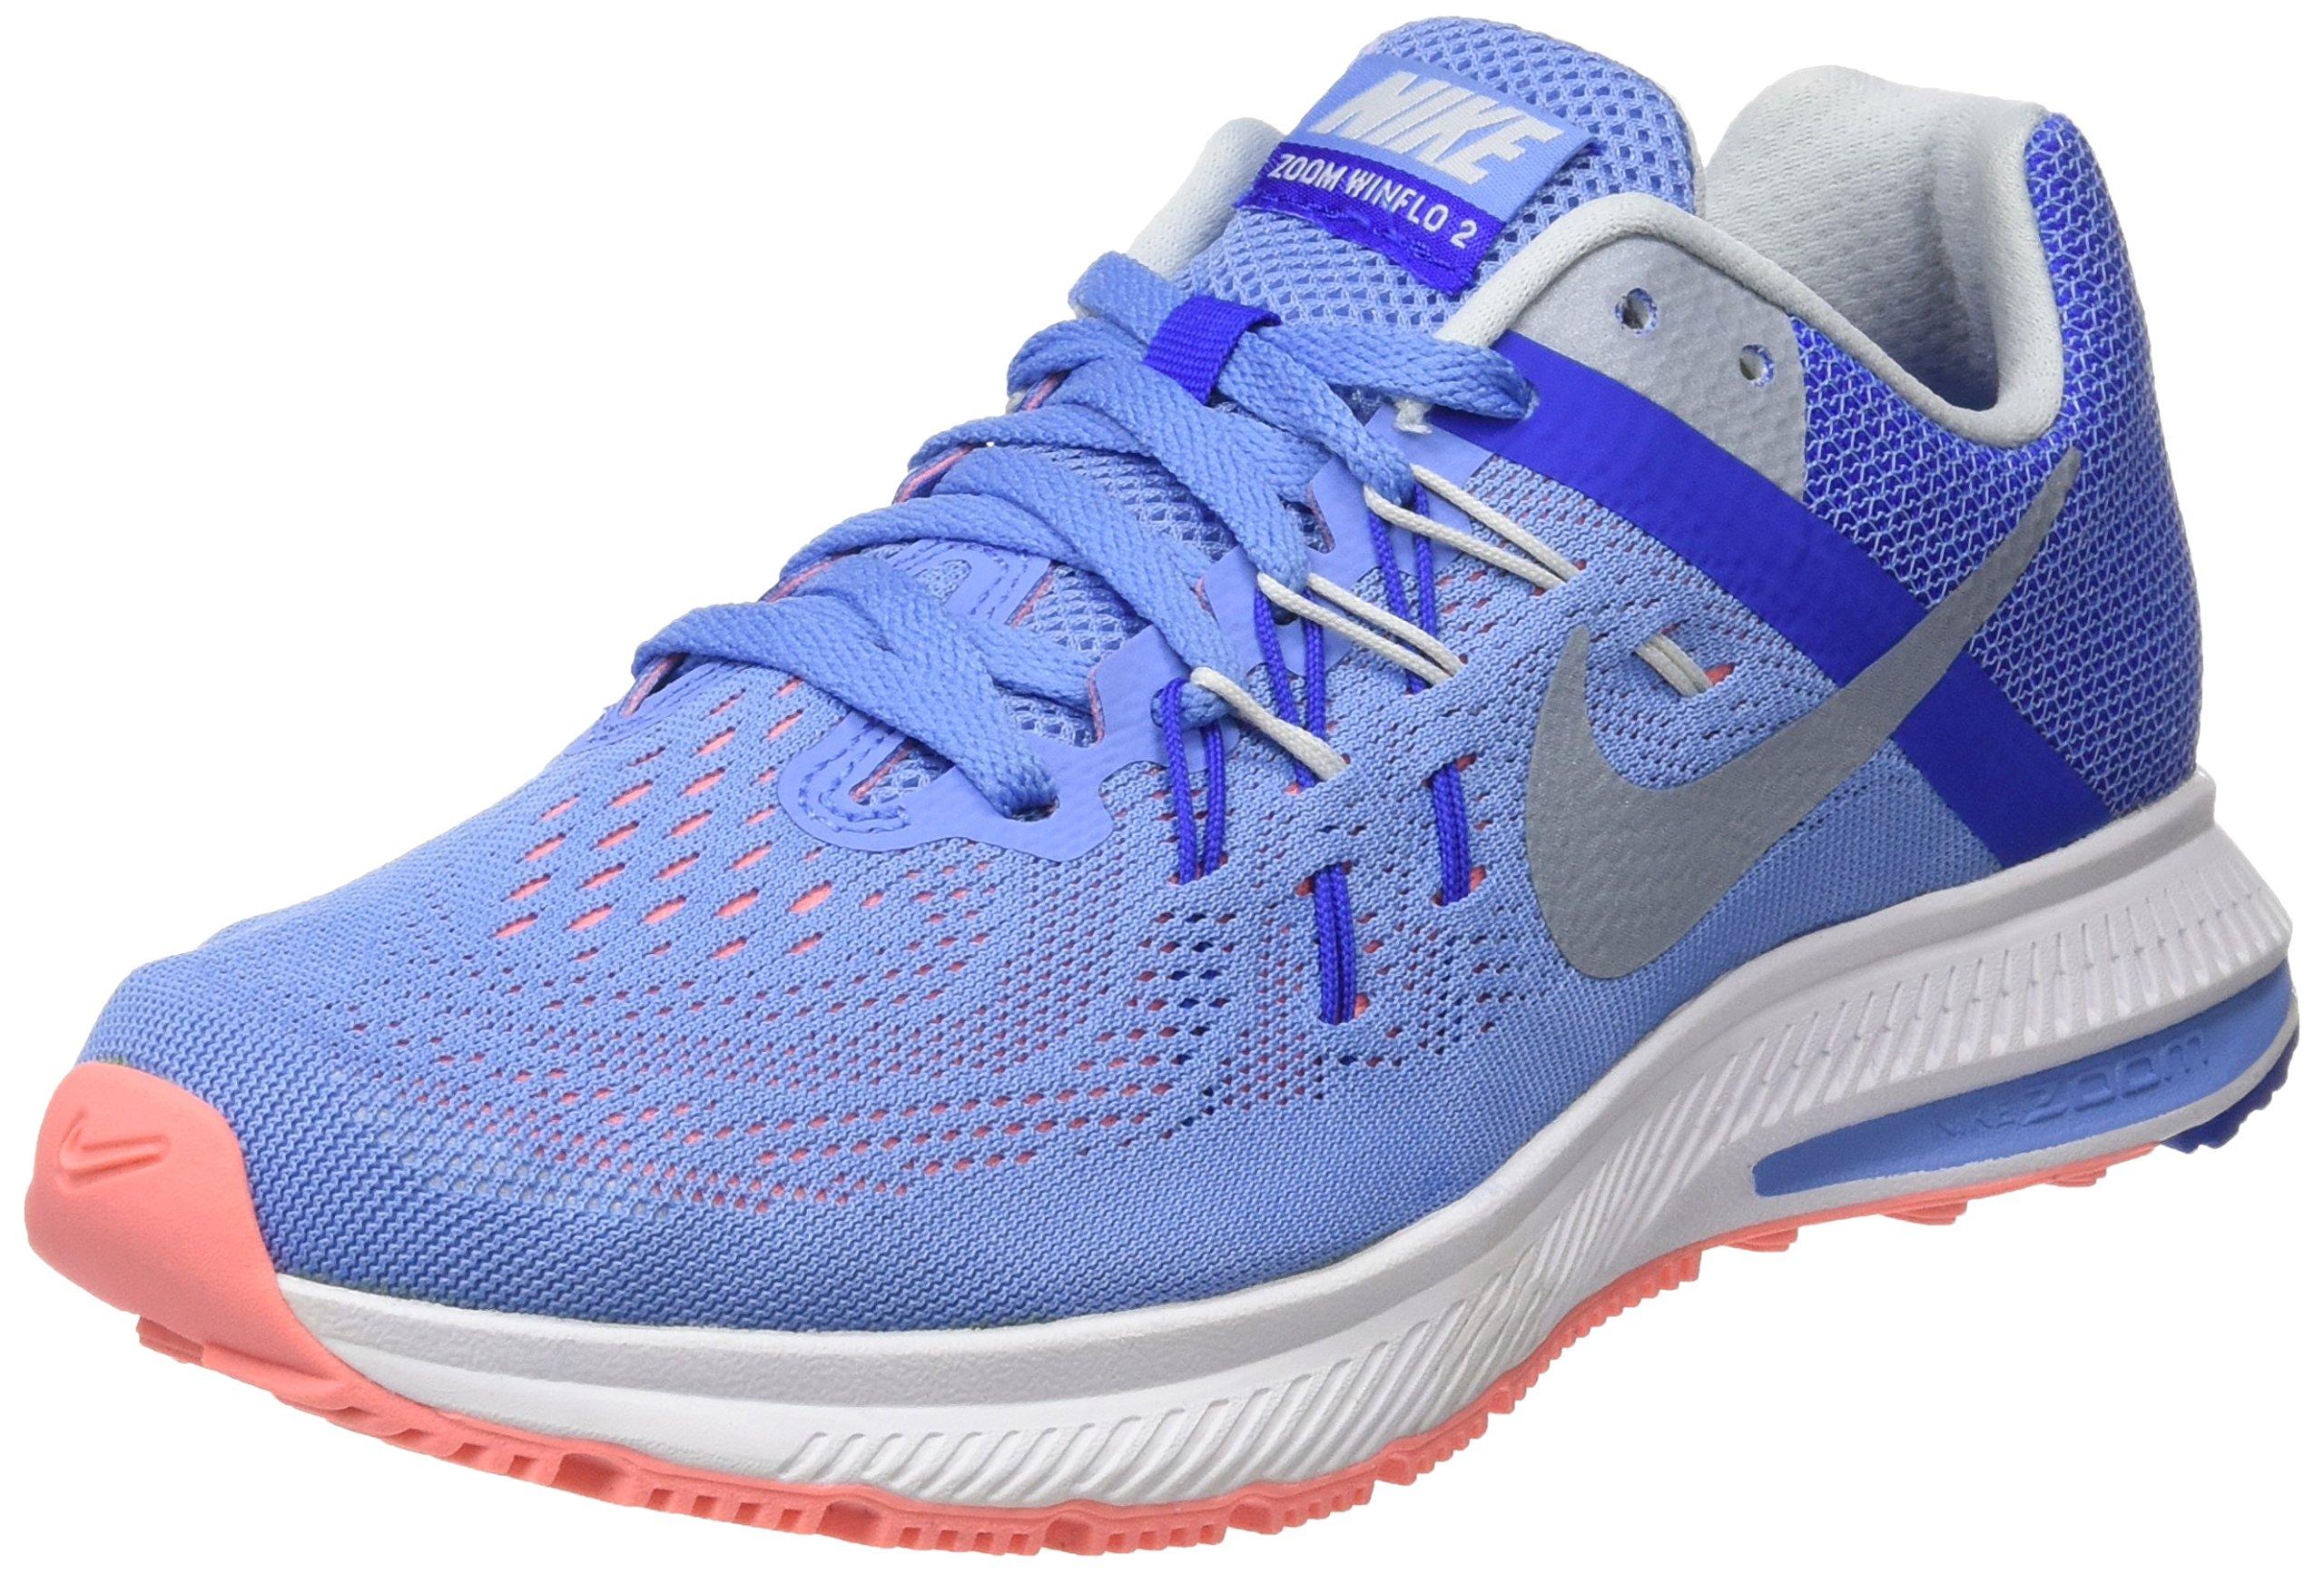 Eu Pltnm FemmeAzulchlk Zoom Rcr 2Baskets Mtlc Wmns Bl Basses Atmc39 Nike Winflo NknO80wXP